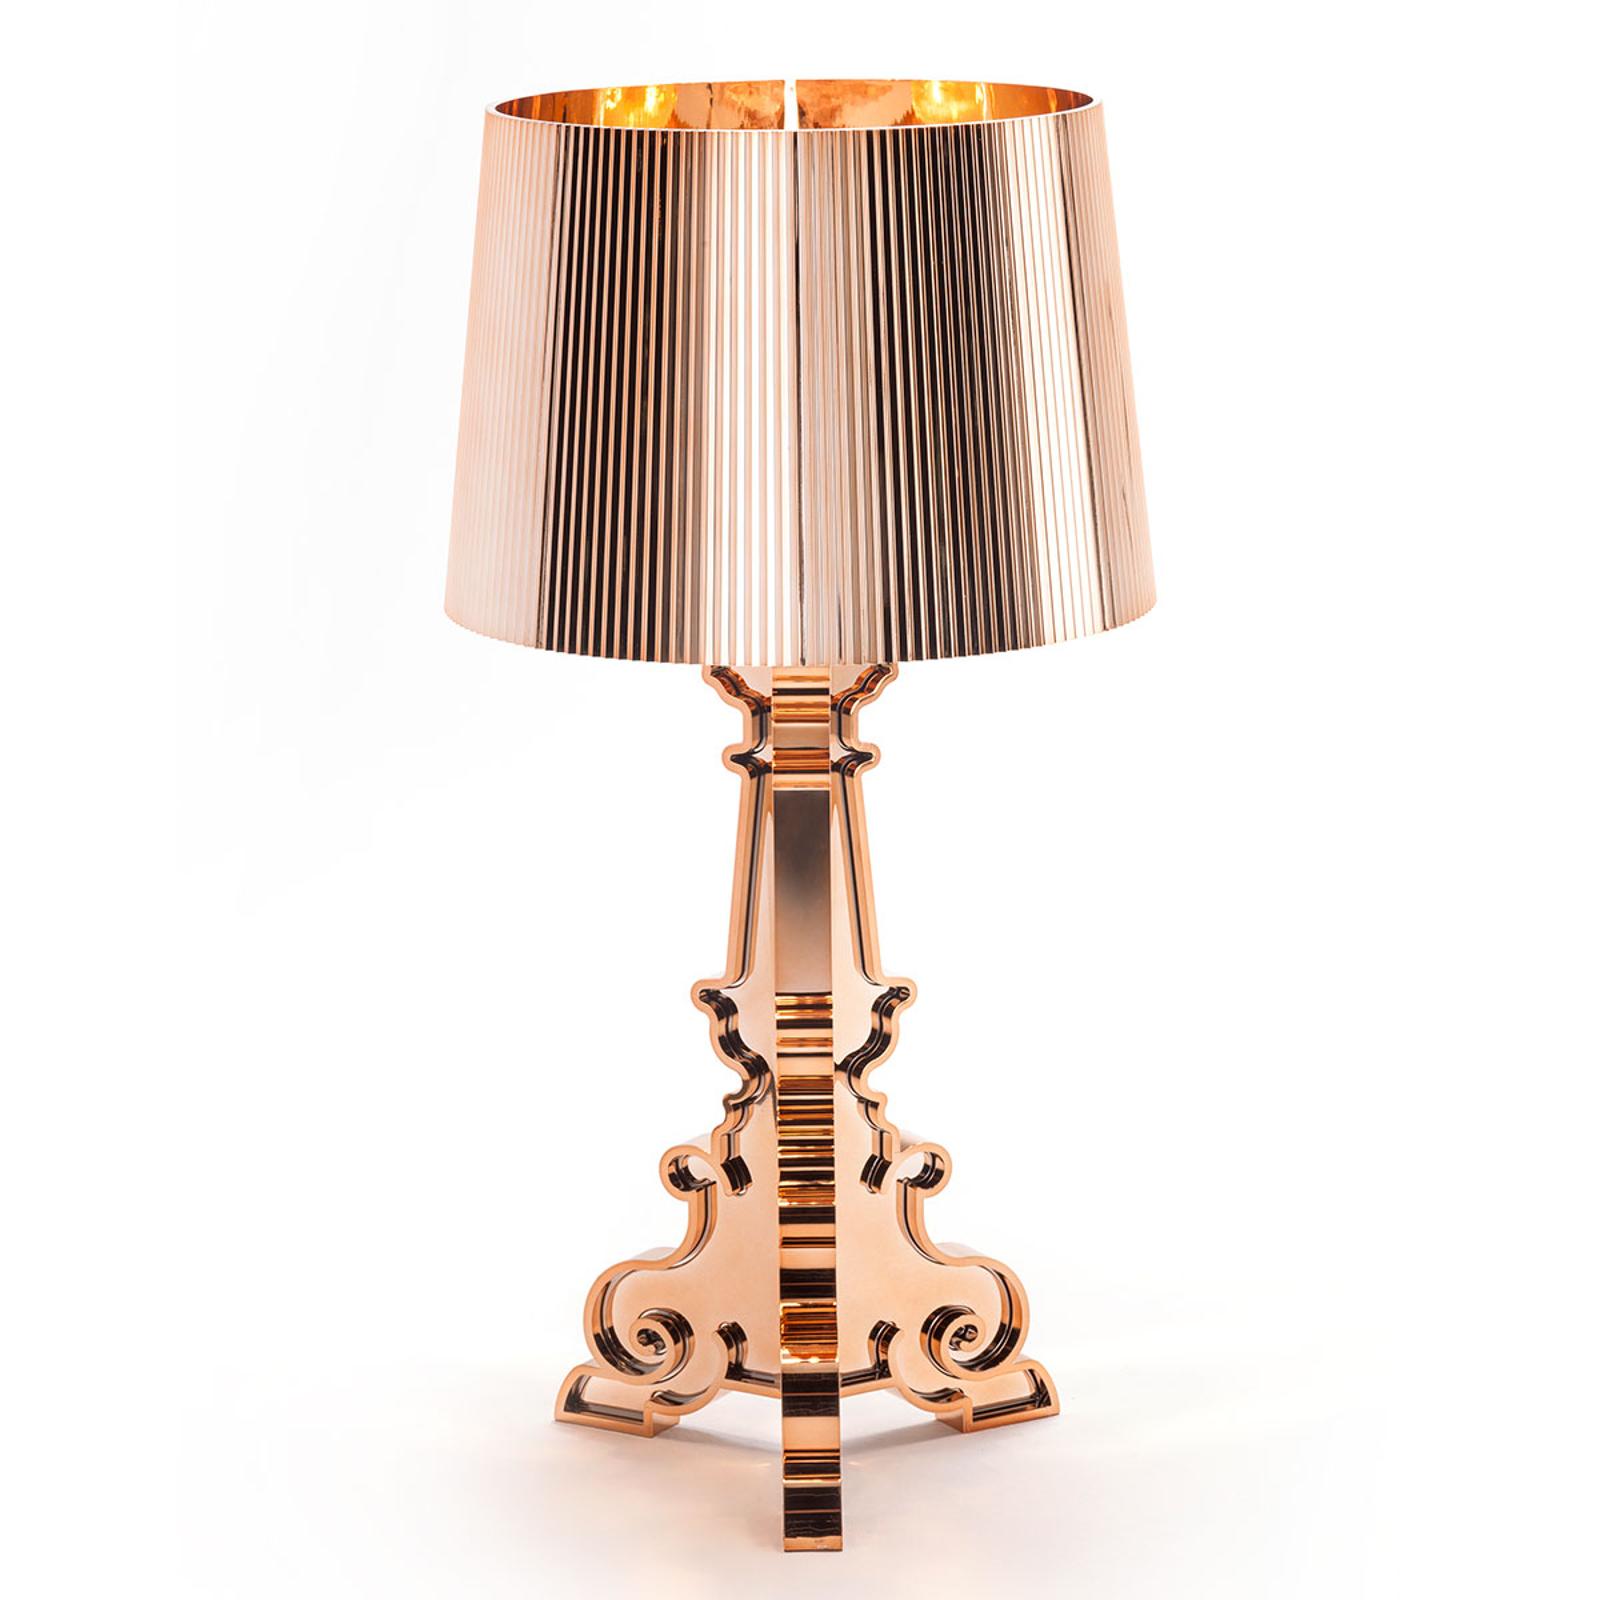 Designer LED bordlampe Bourgie, kobber